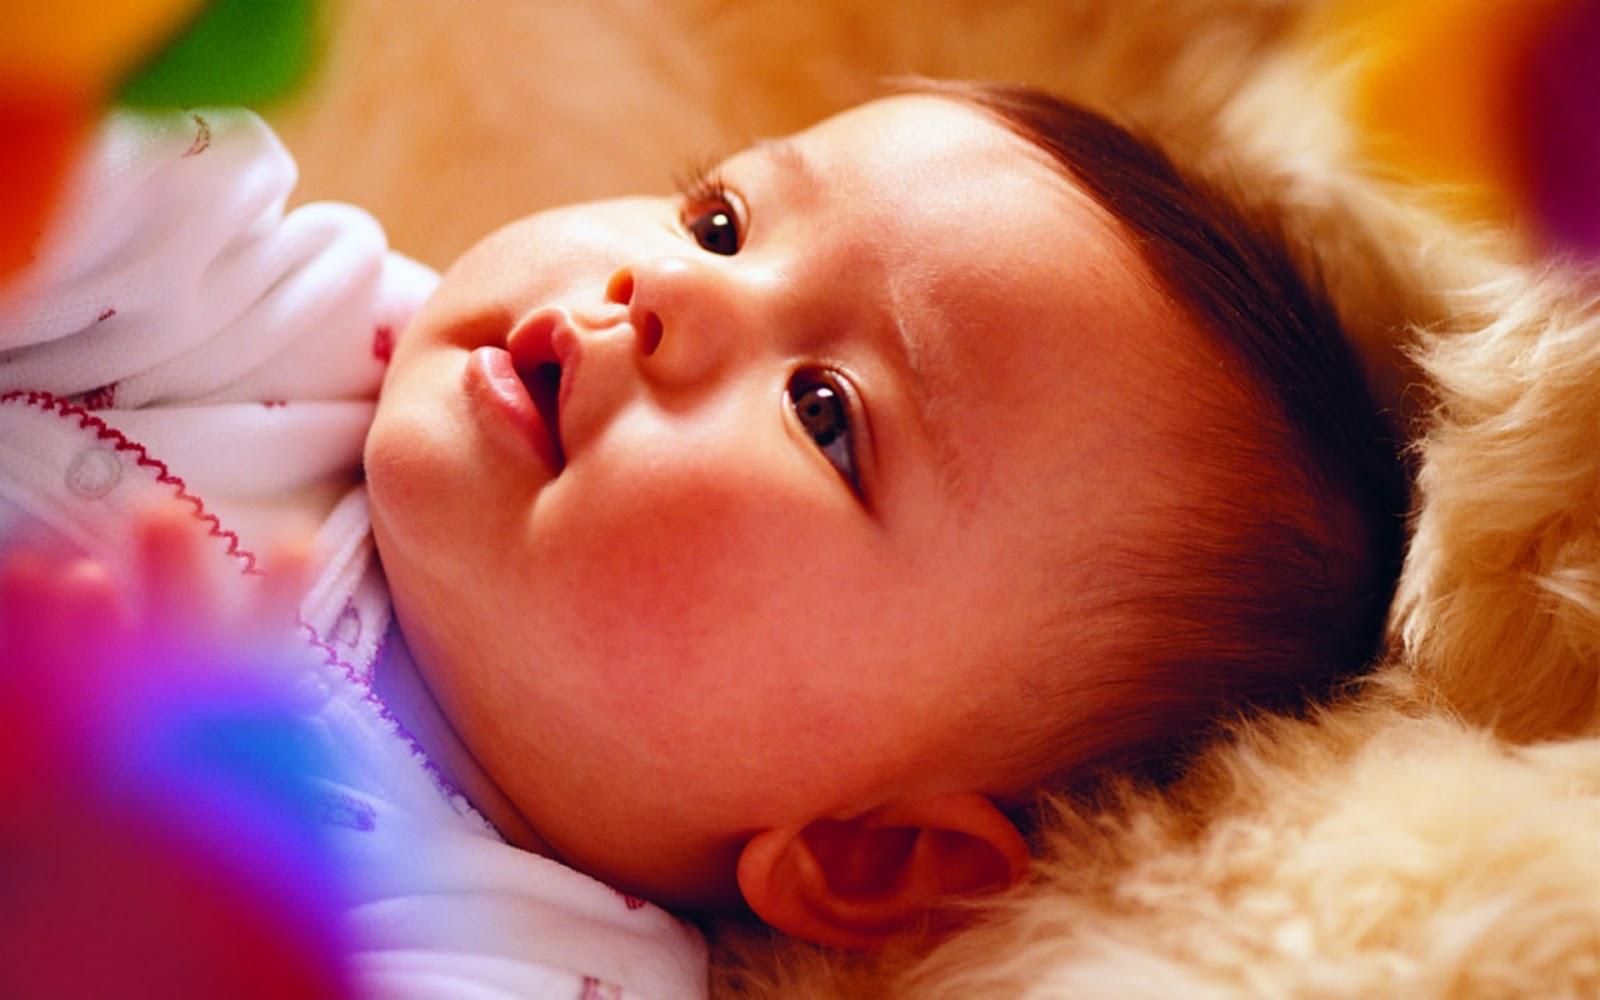 Cute Baby Wallpapers Hd Free: HD Wallpapers Fine: Cute,nice,beautiful,angel,sweet Baby